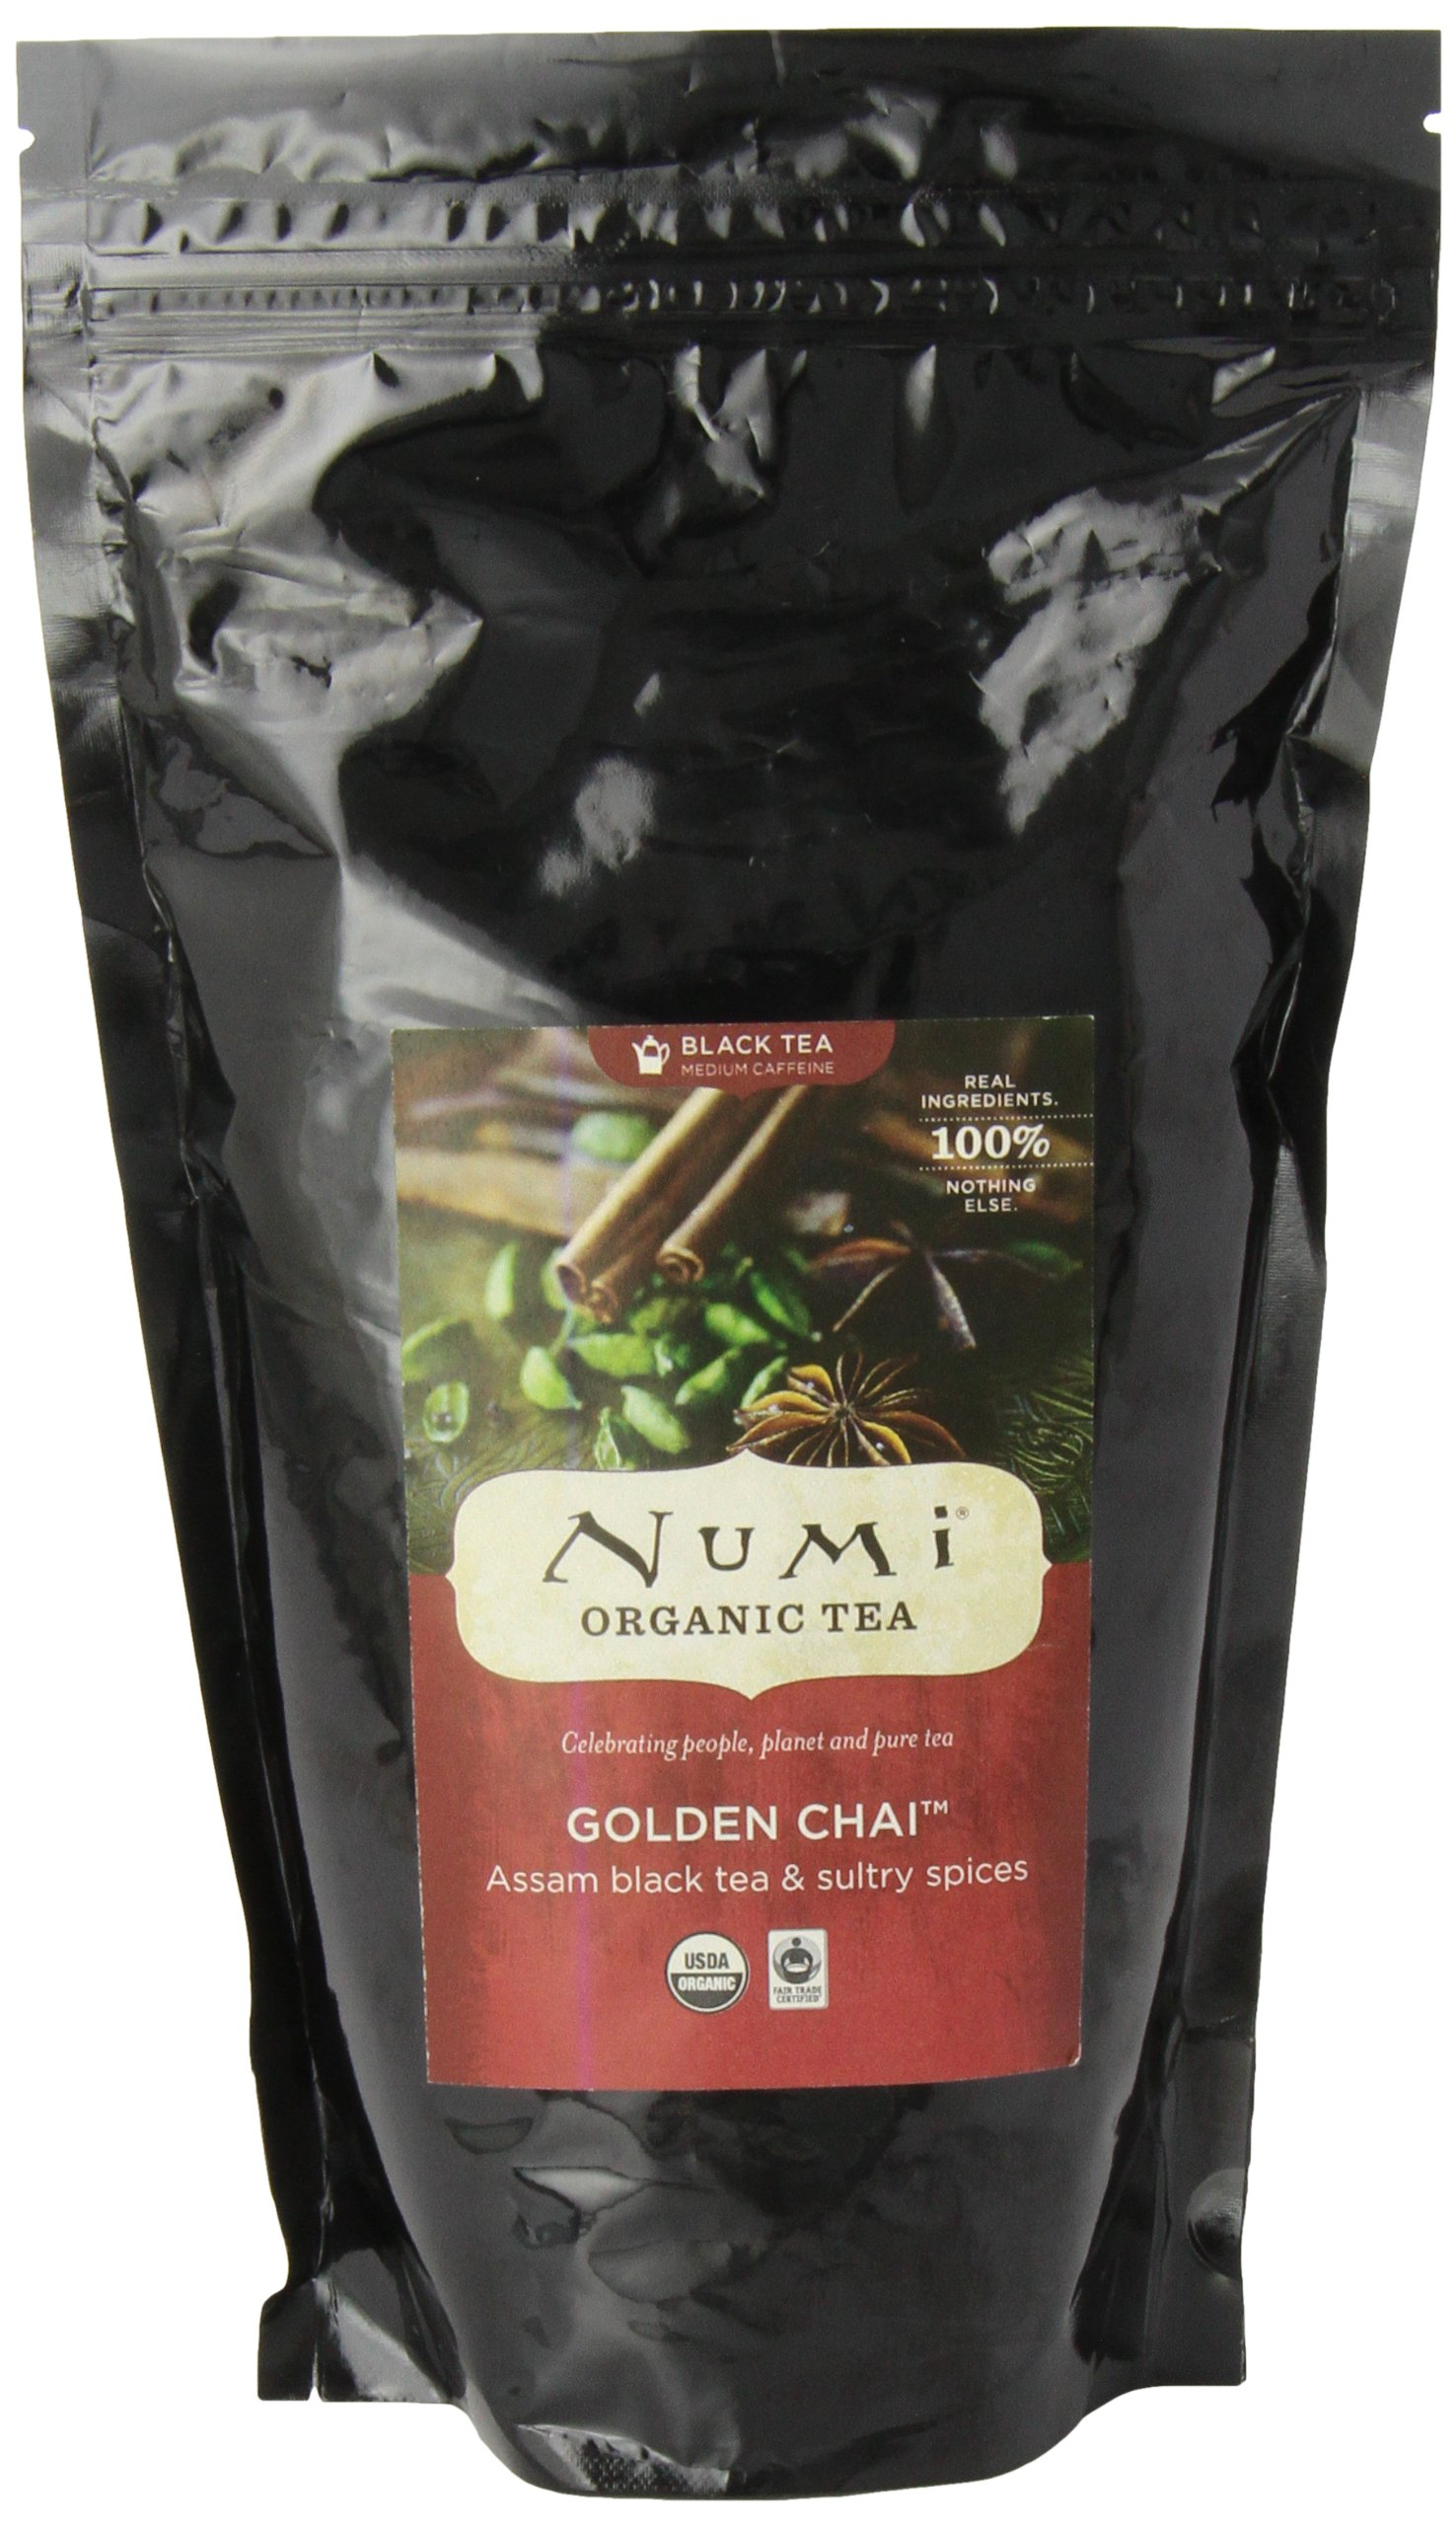 Numi Organic Tea Golden Chai, 16 Ounce Pouch (Pack of 6), Loose Leaf Black Tea by Numi Organic Tea (Image #5)